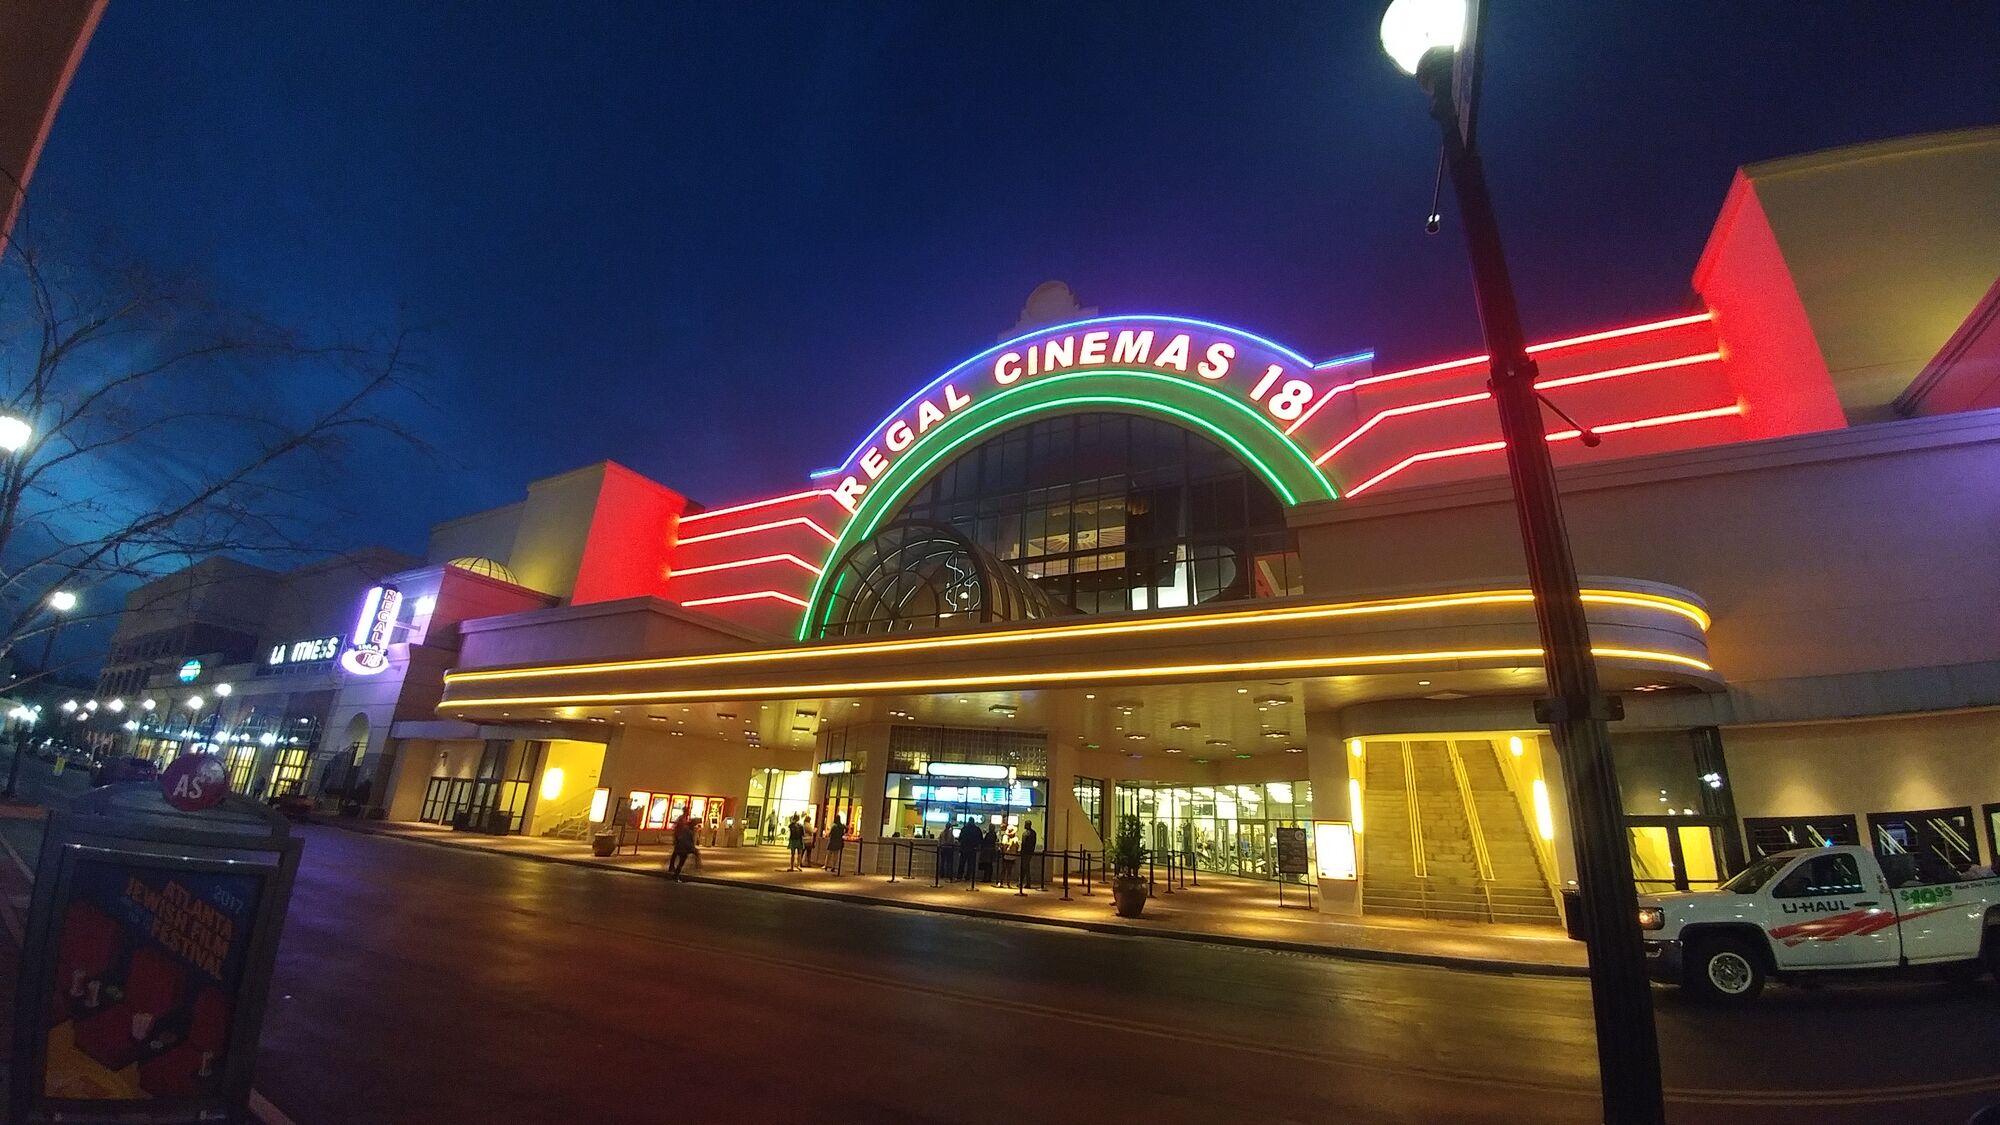 Regal Cinemas | Malls and Retail Wiki | FANDOM powered by Wikia